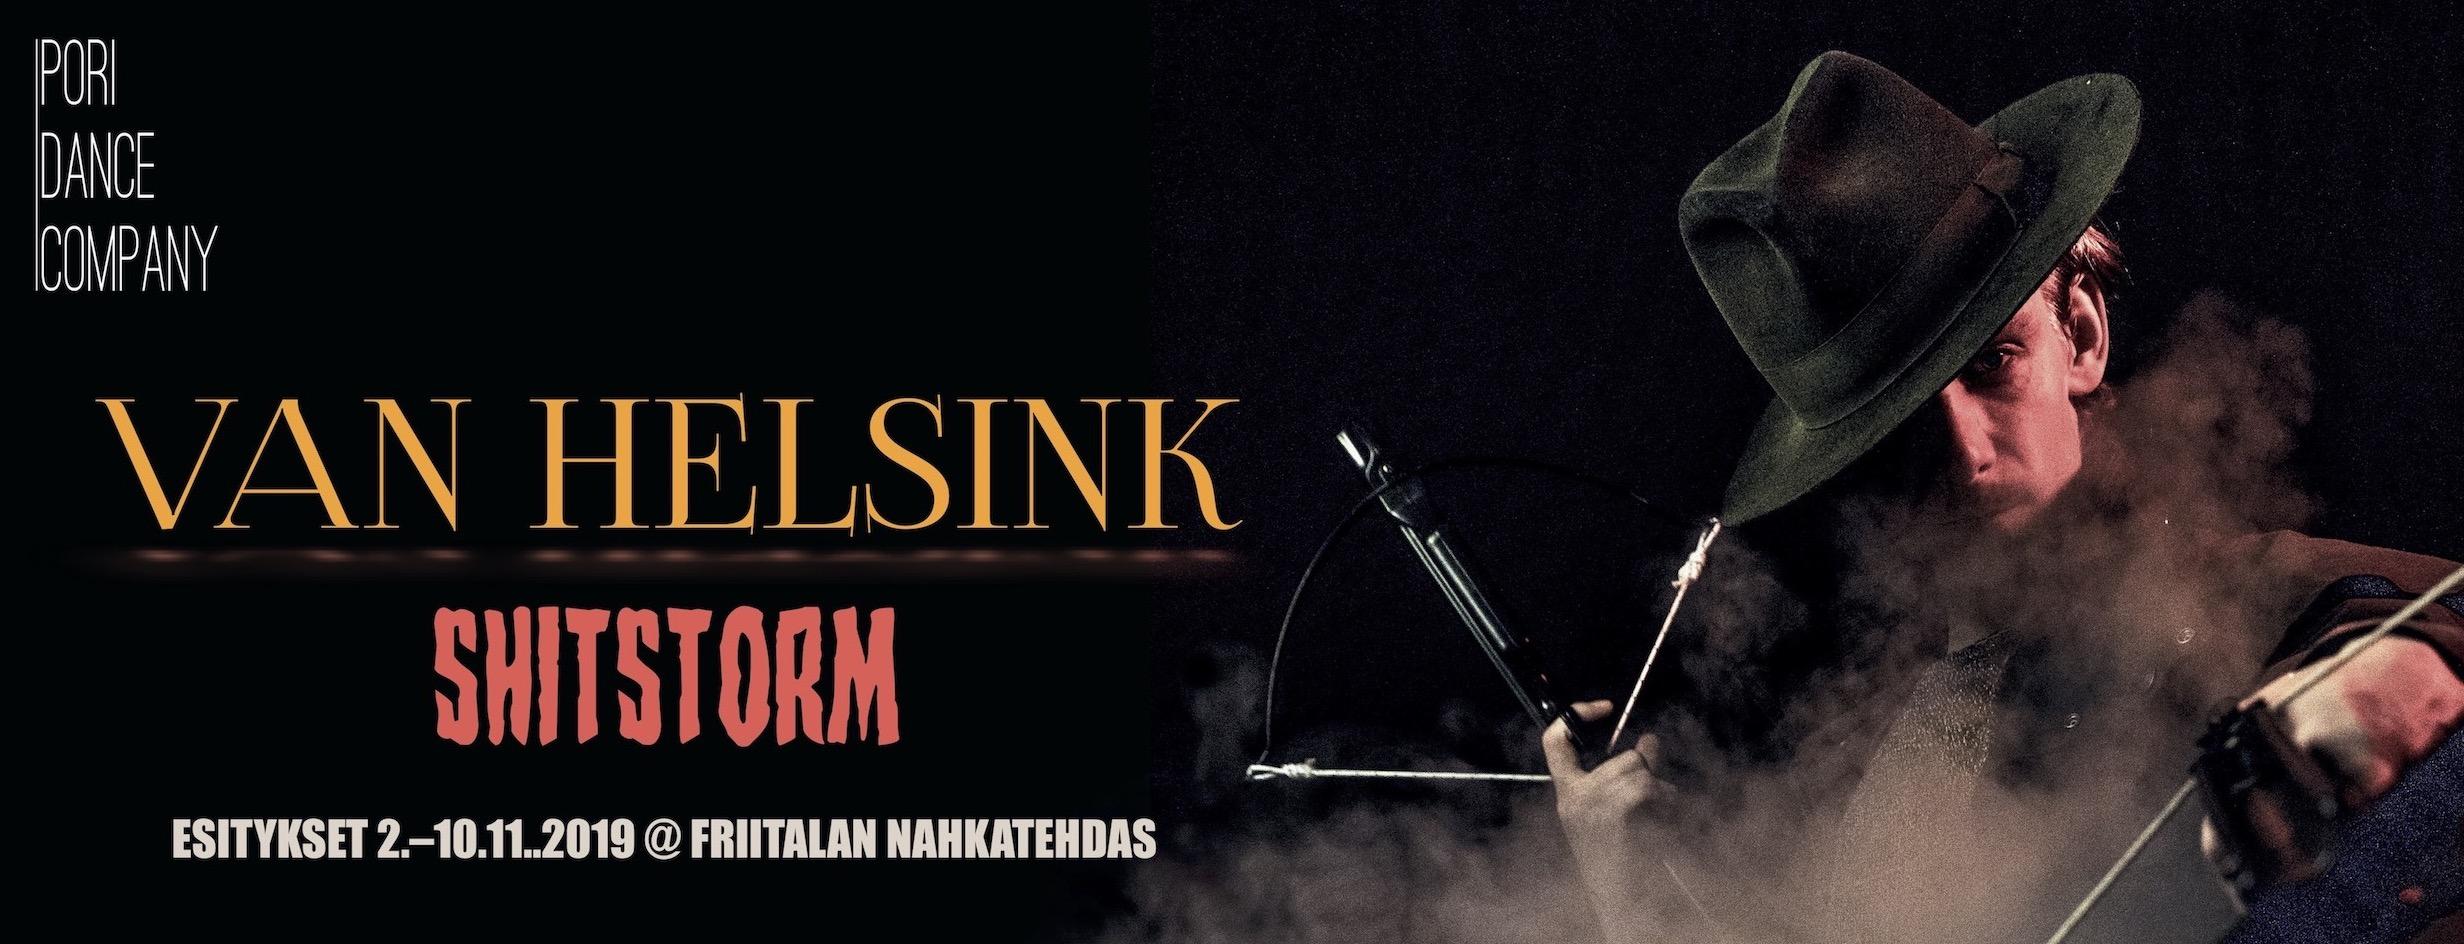 Pori Dance Company – Van Helsink: Shitstorm